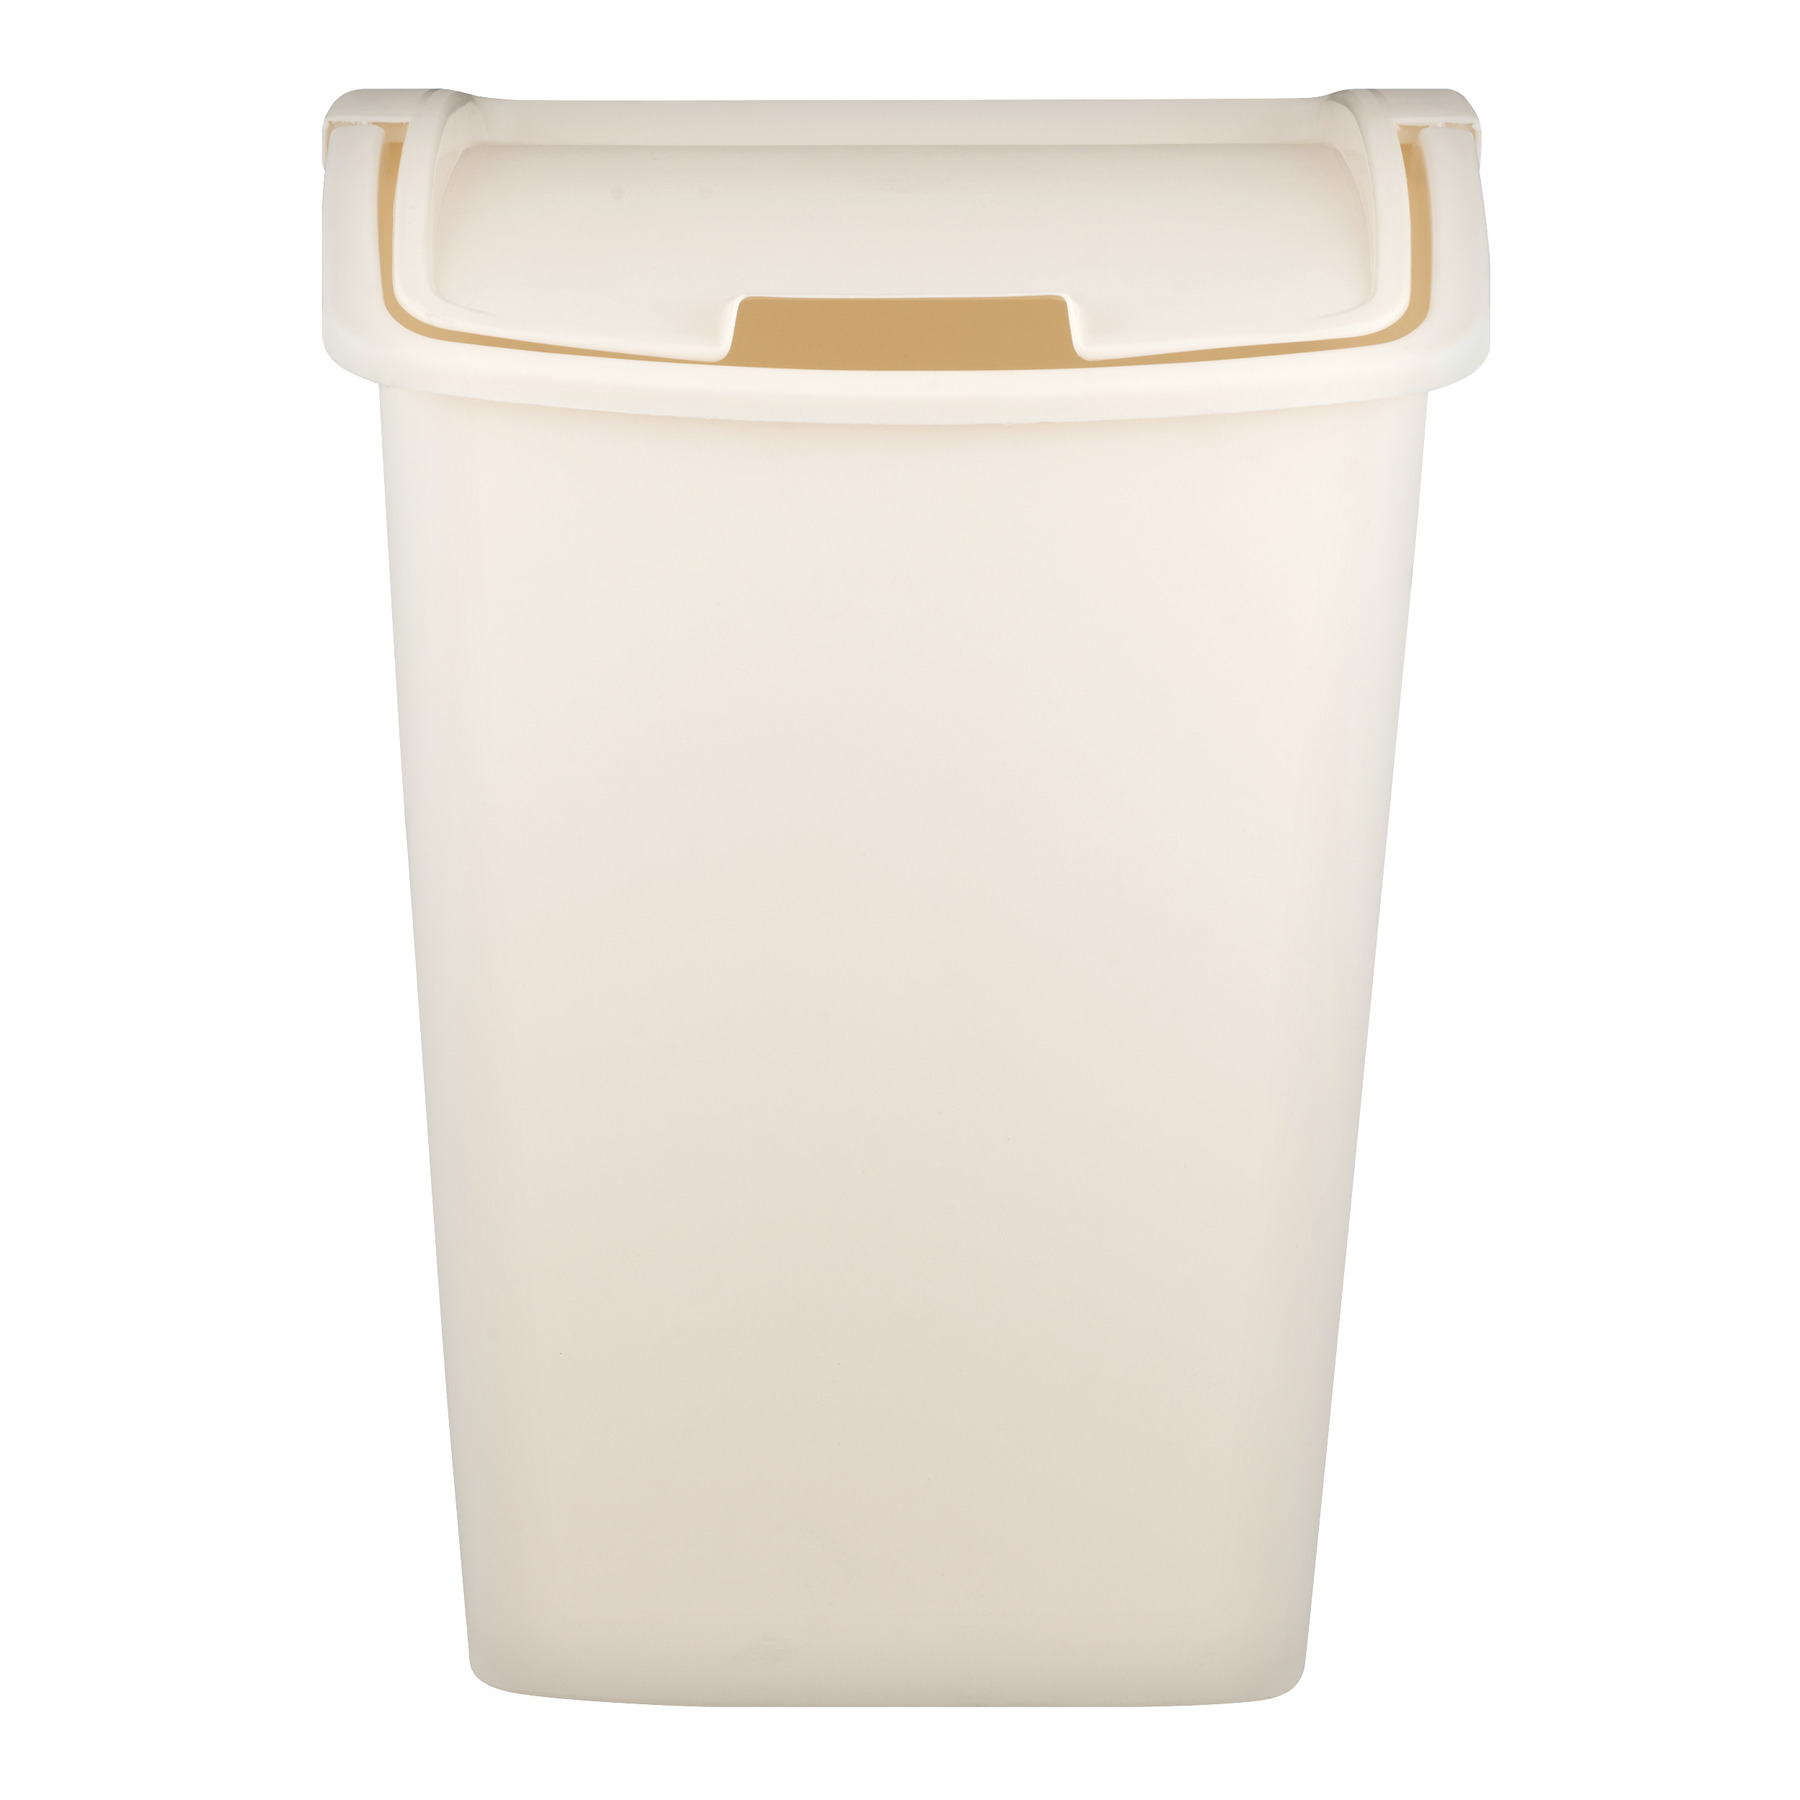 Gtin 071691153528 Rubbermaid Trash Receptacles 45 Qt